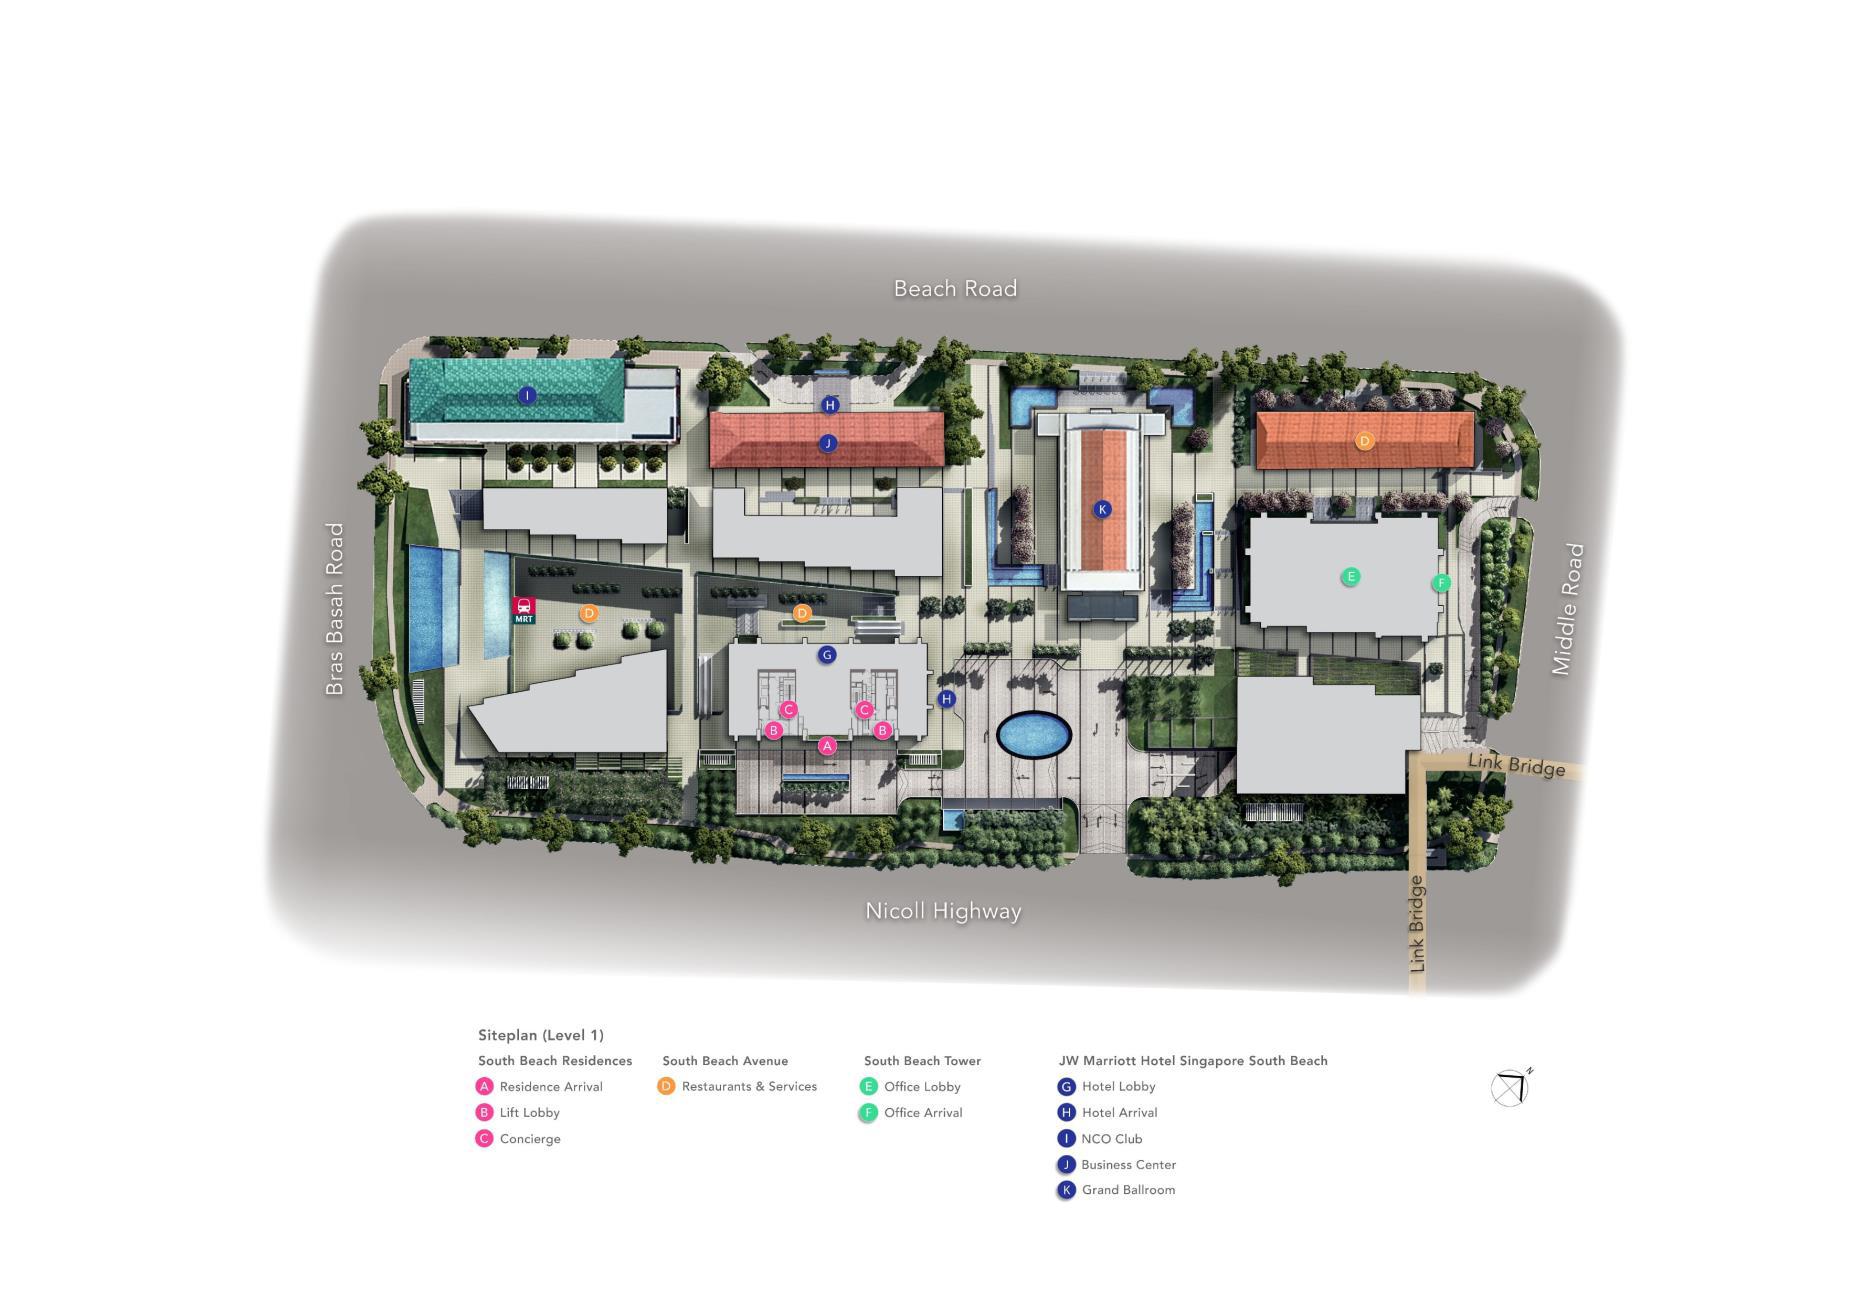 South beach residences site map